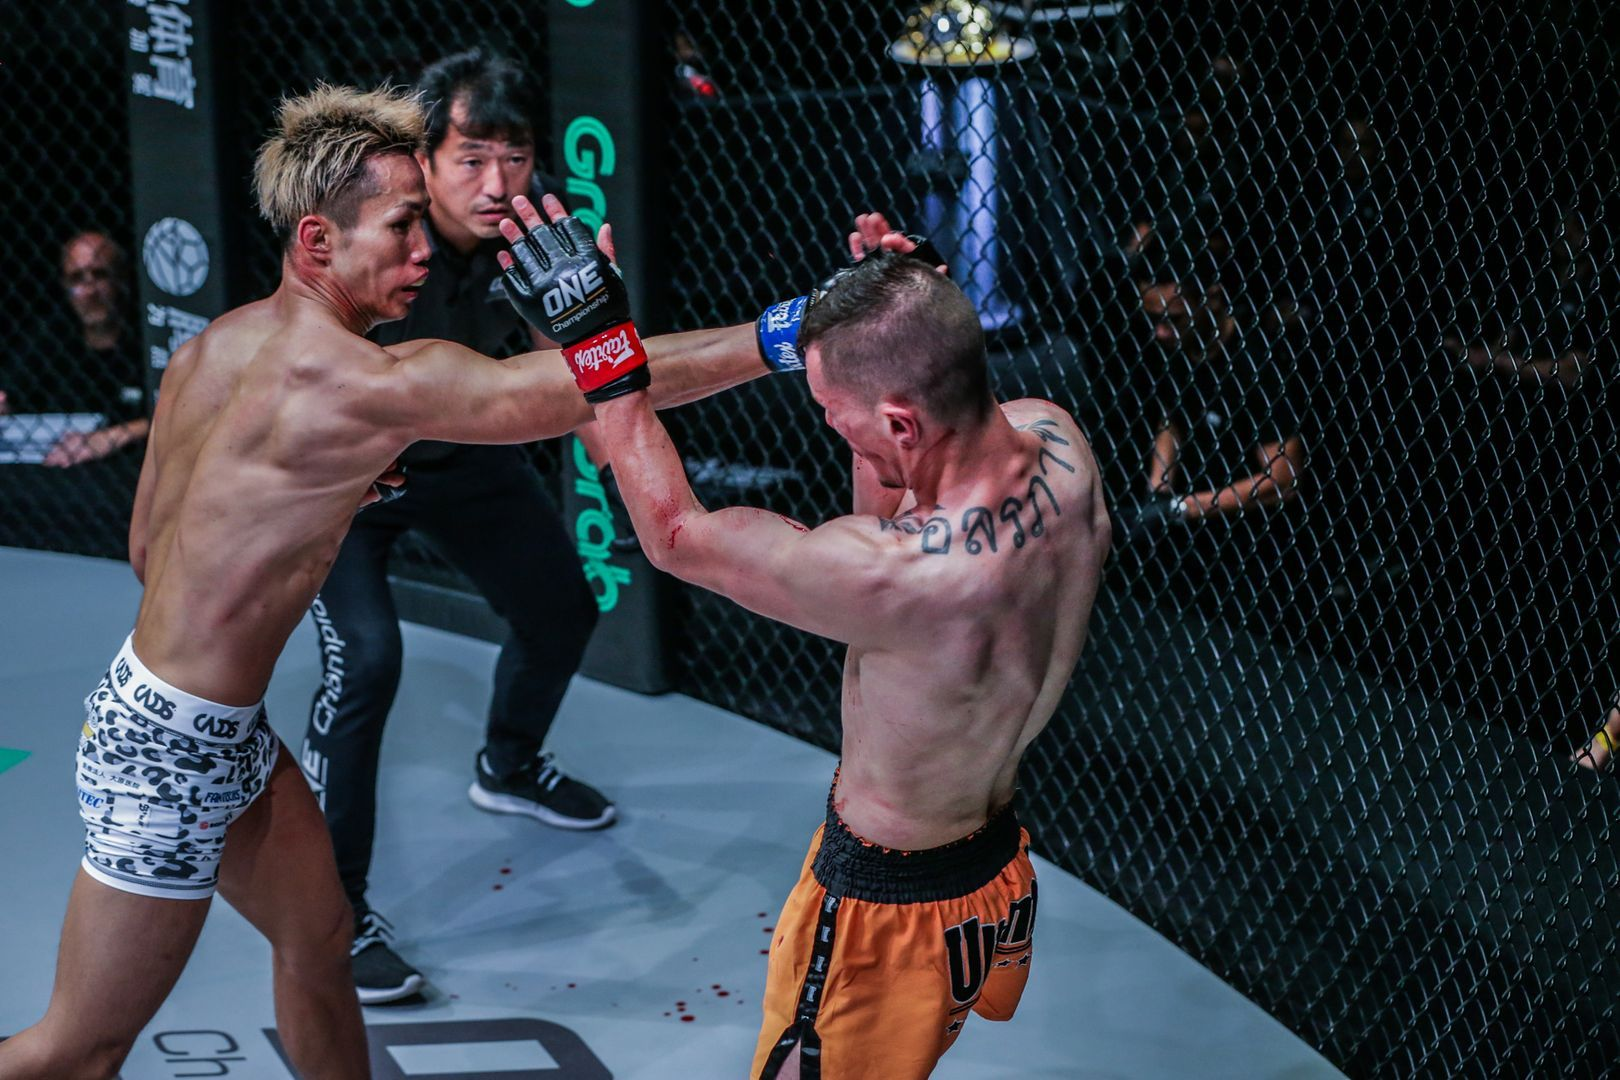 Taiki Naito defeats Alexi Serepisos in his ONE Super Series debut